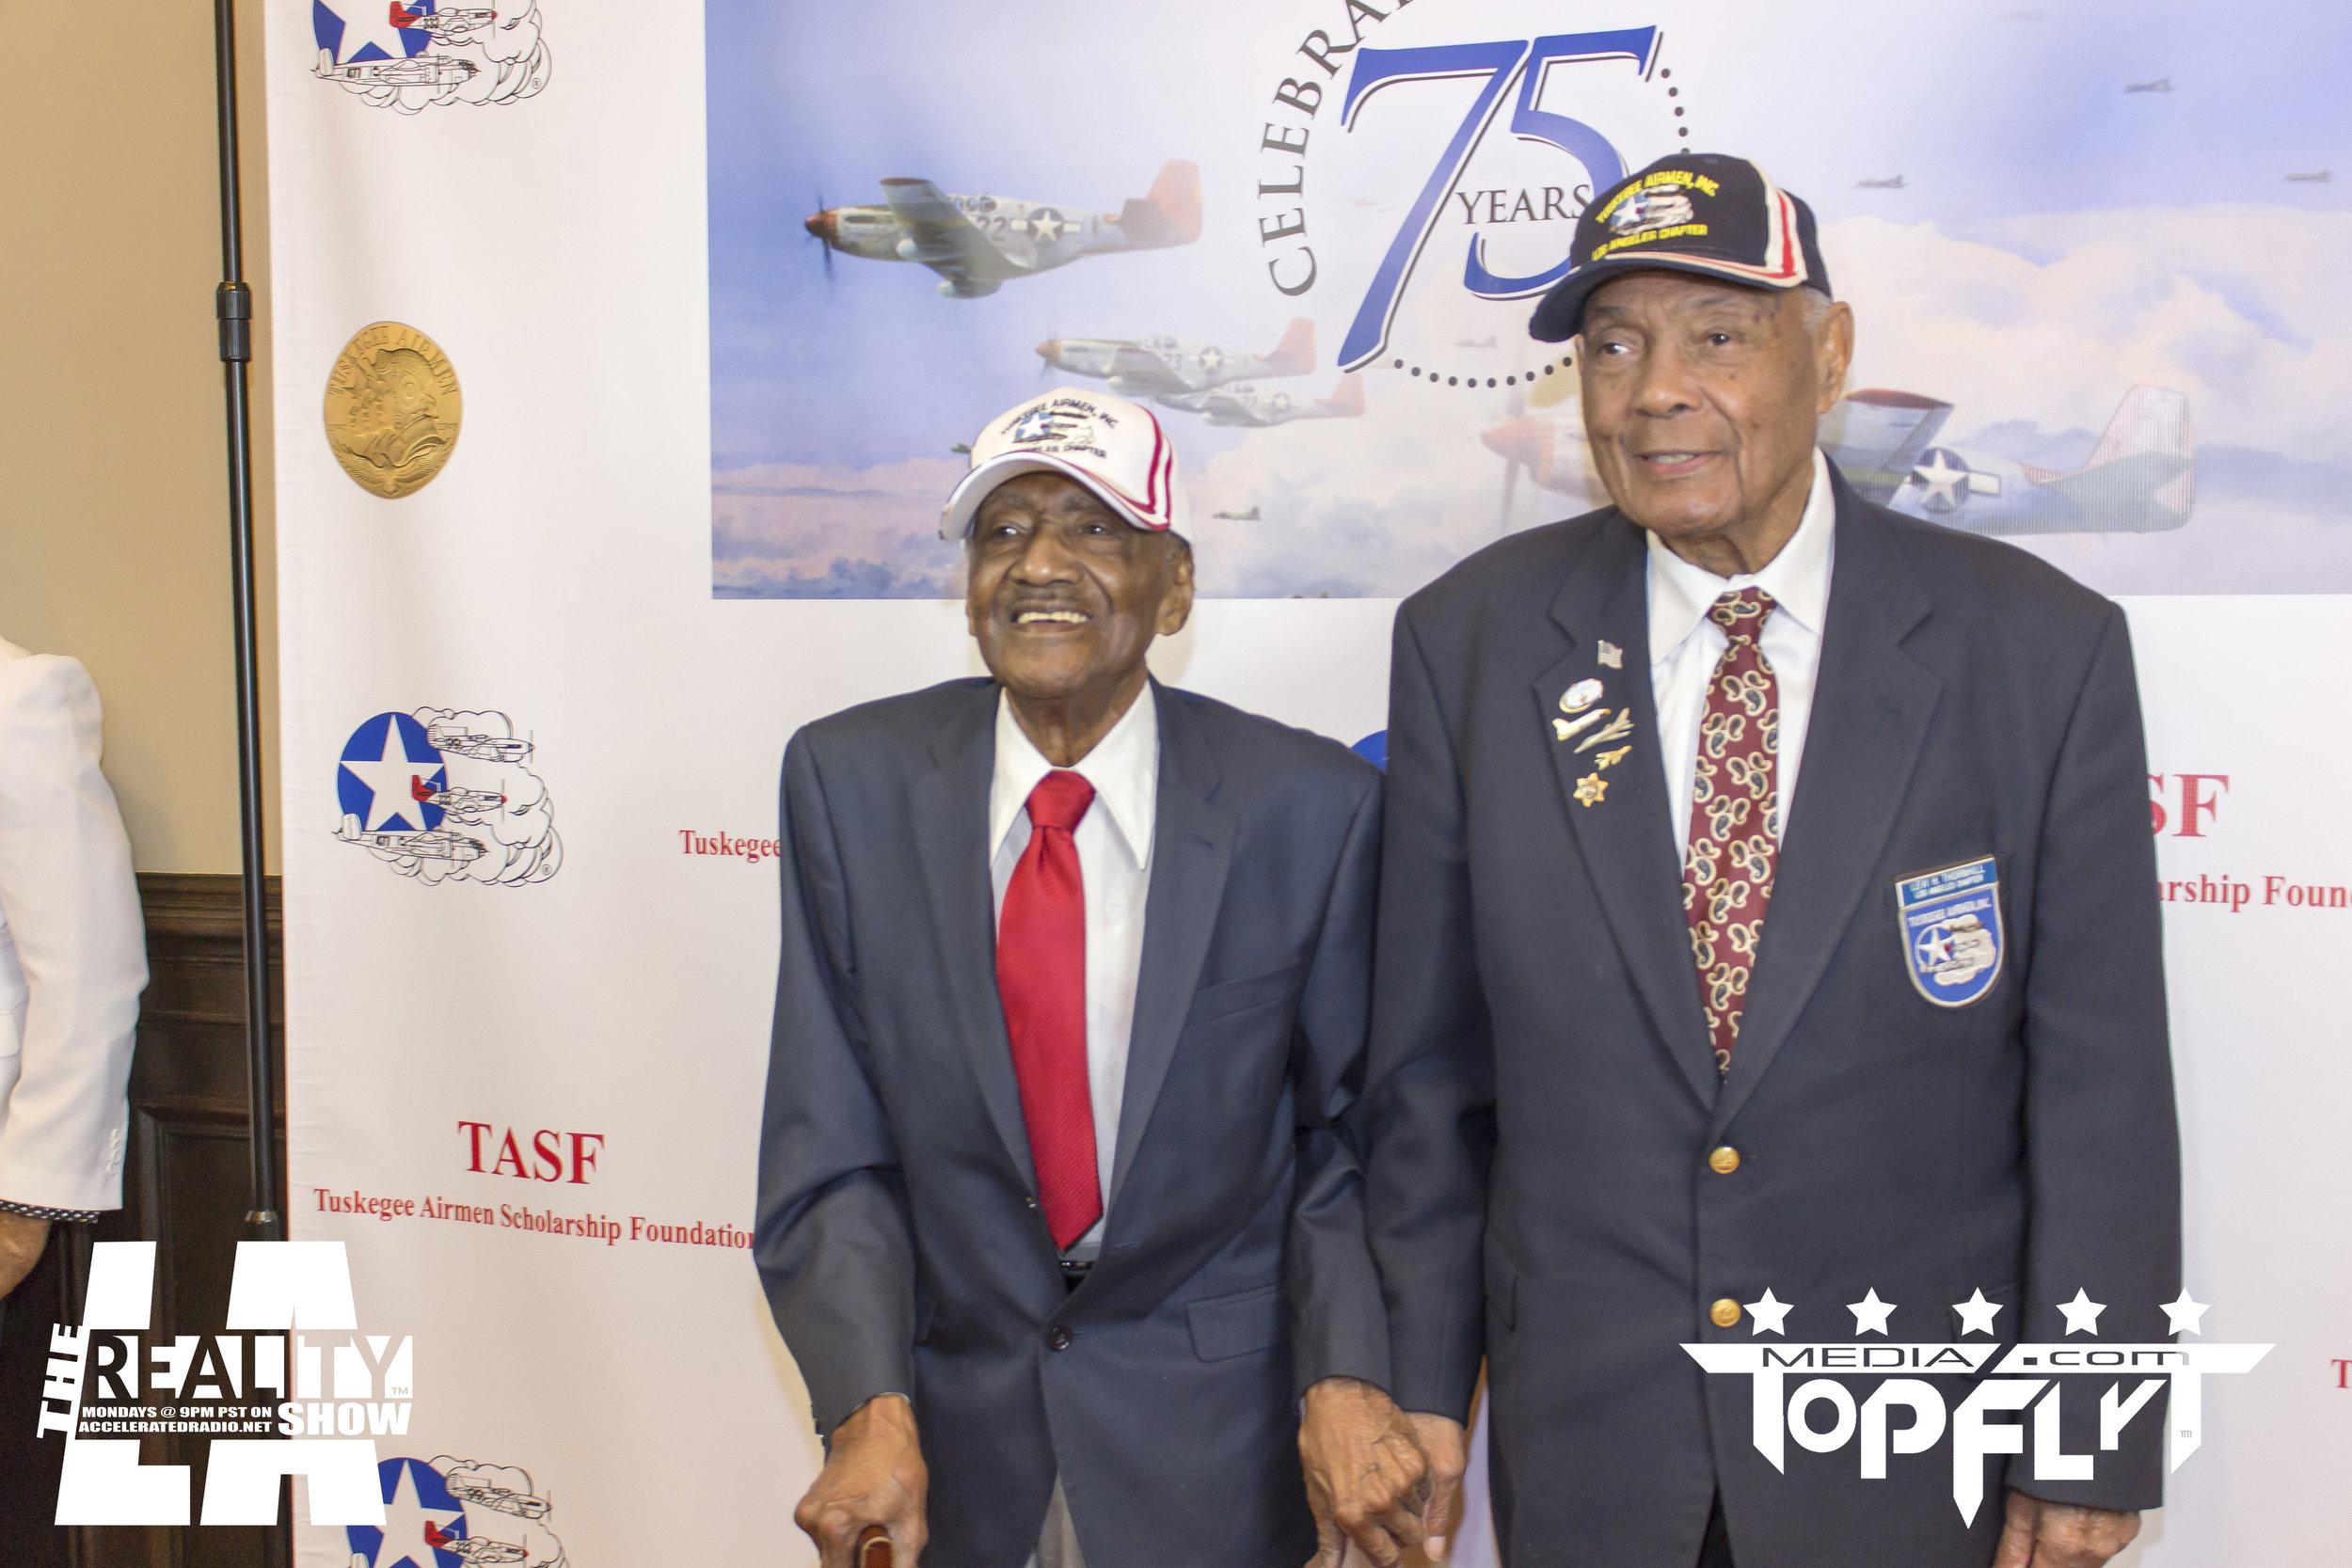 The Reality Show LA - Tuskegee Airmen 75th Anniversary VIP Reception_17.jpg